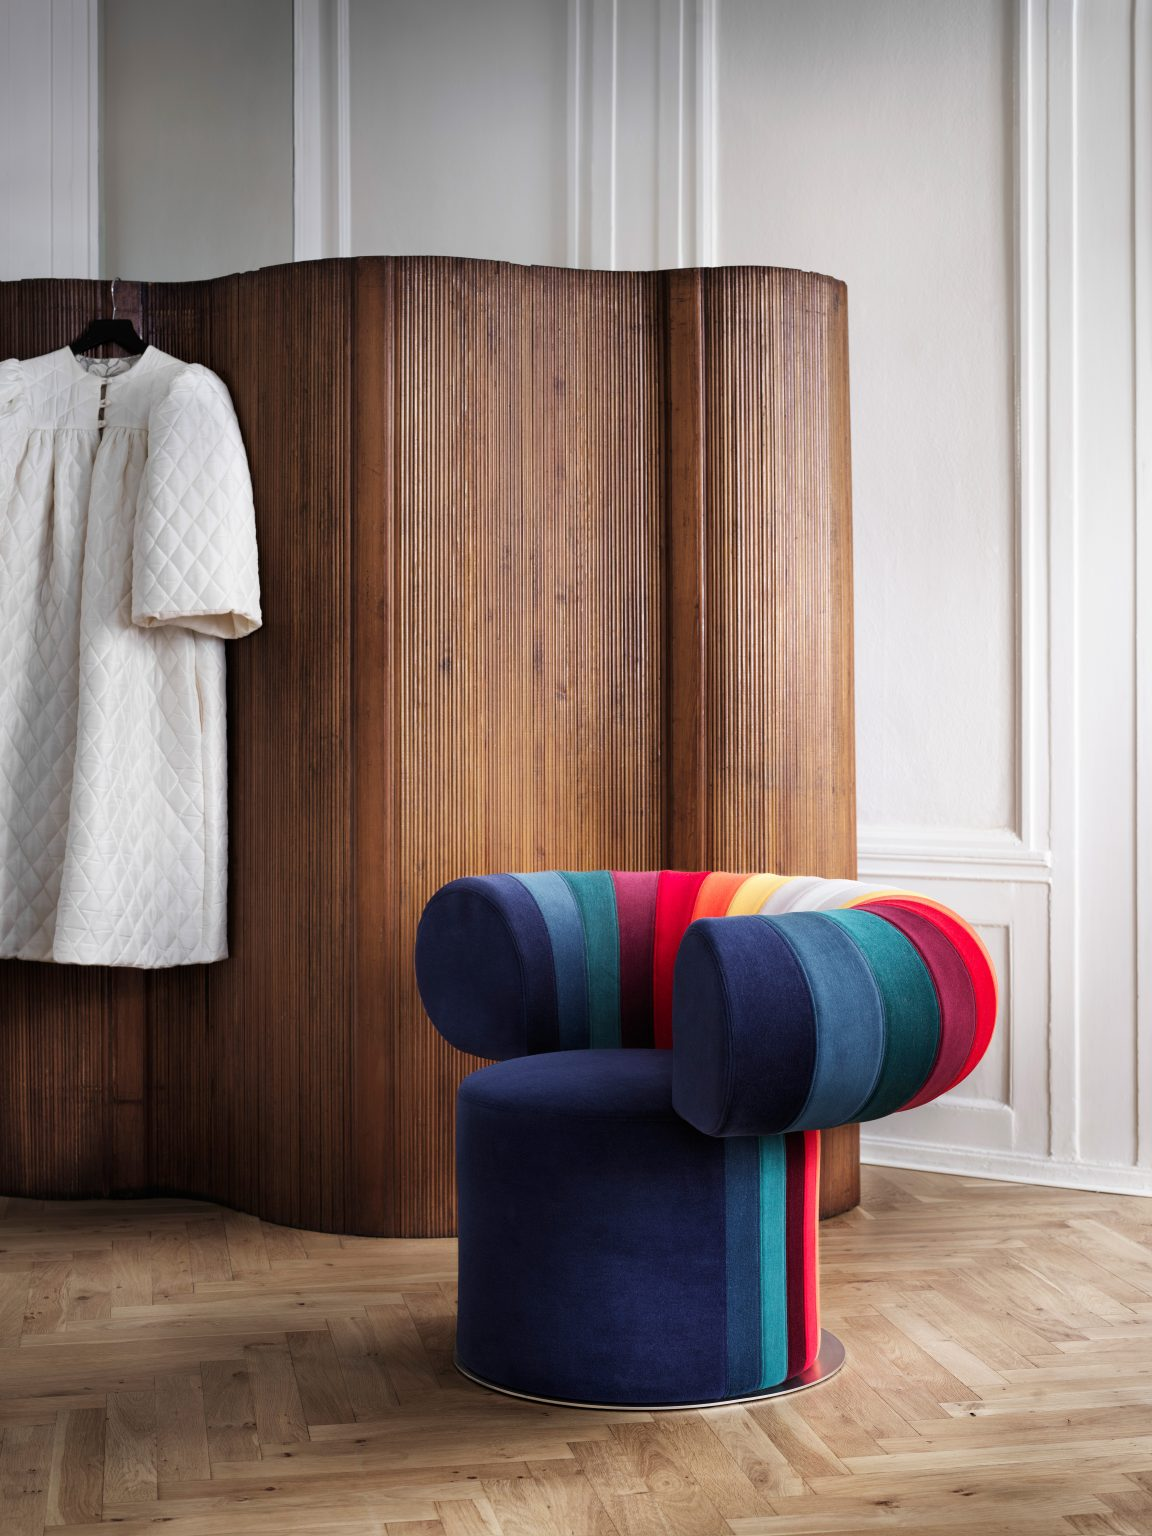 Biennale Interieur - Belgium's leading design and interior event - Big-talk-project-1-new.jpg